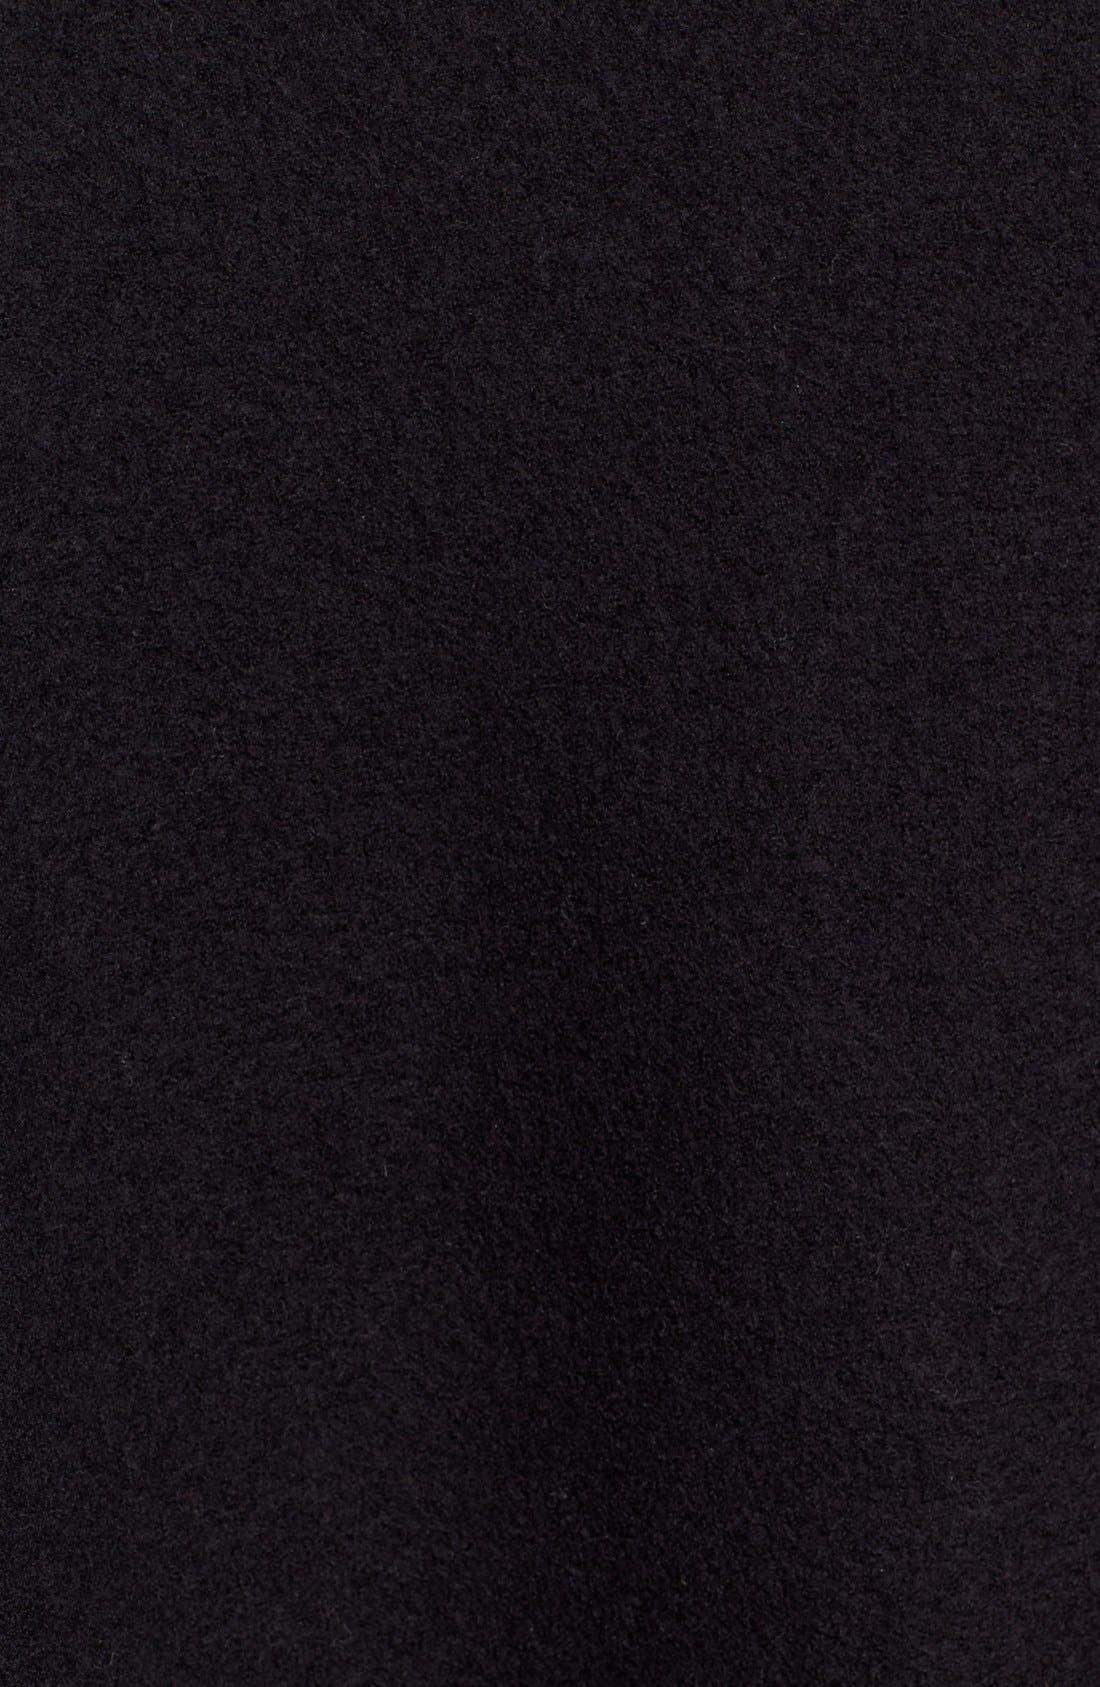 EILEEN FISHER,                             Boiled Wool Funnel Neck Coat,                             Alternate thumbnail 2, color,                             001